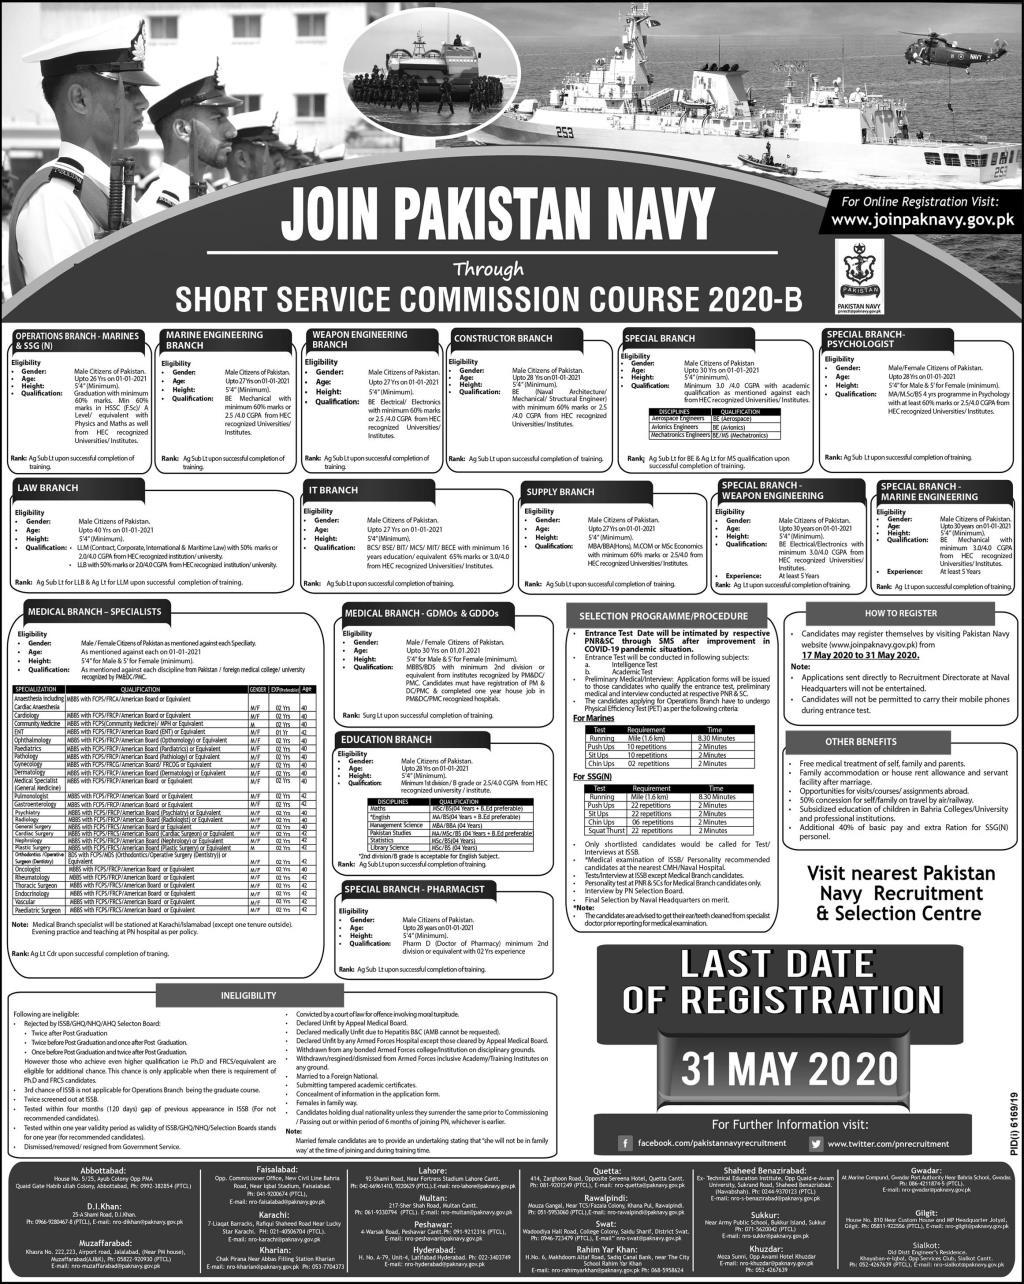 Join Pakistan Navy Short Service Commission Course 2020-B